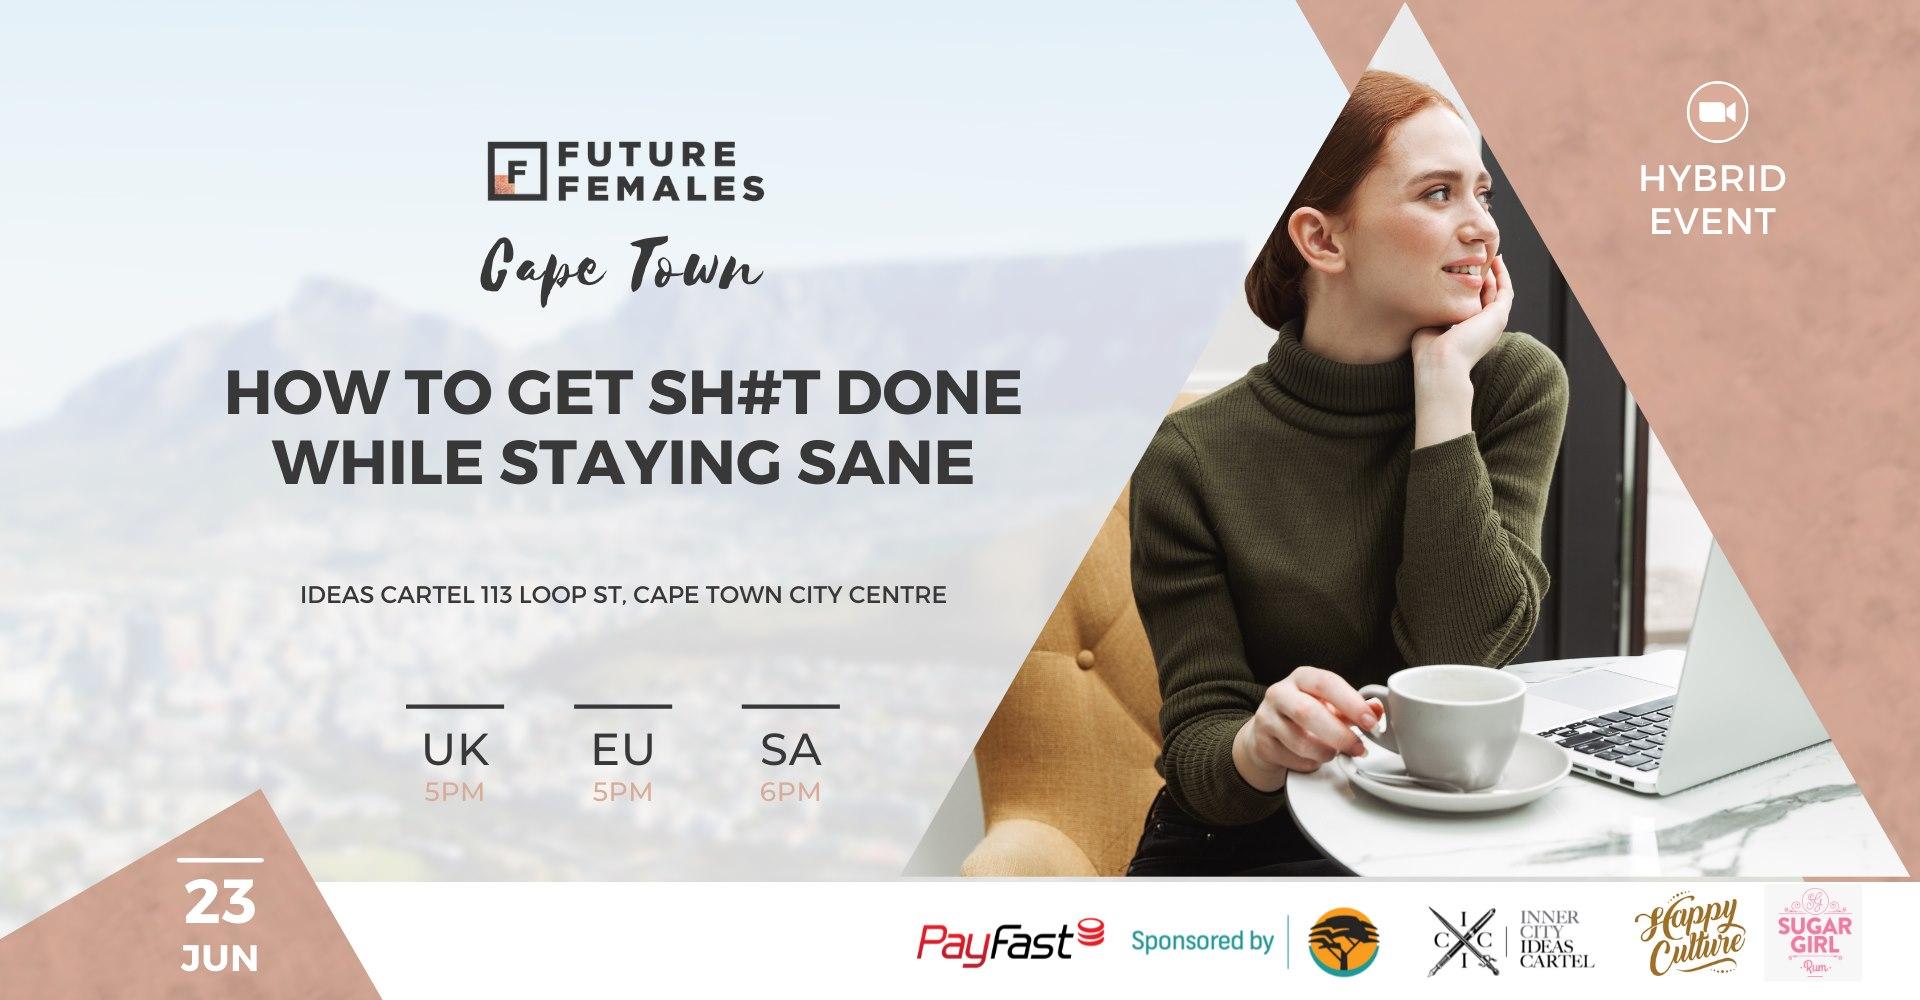 Future Females Cape Town Event - 23 June